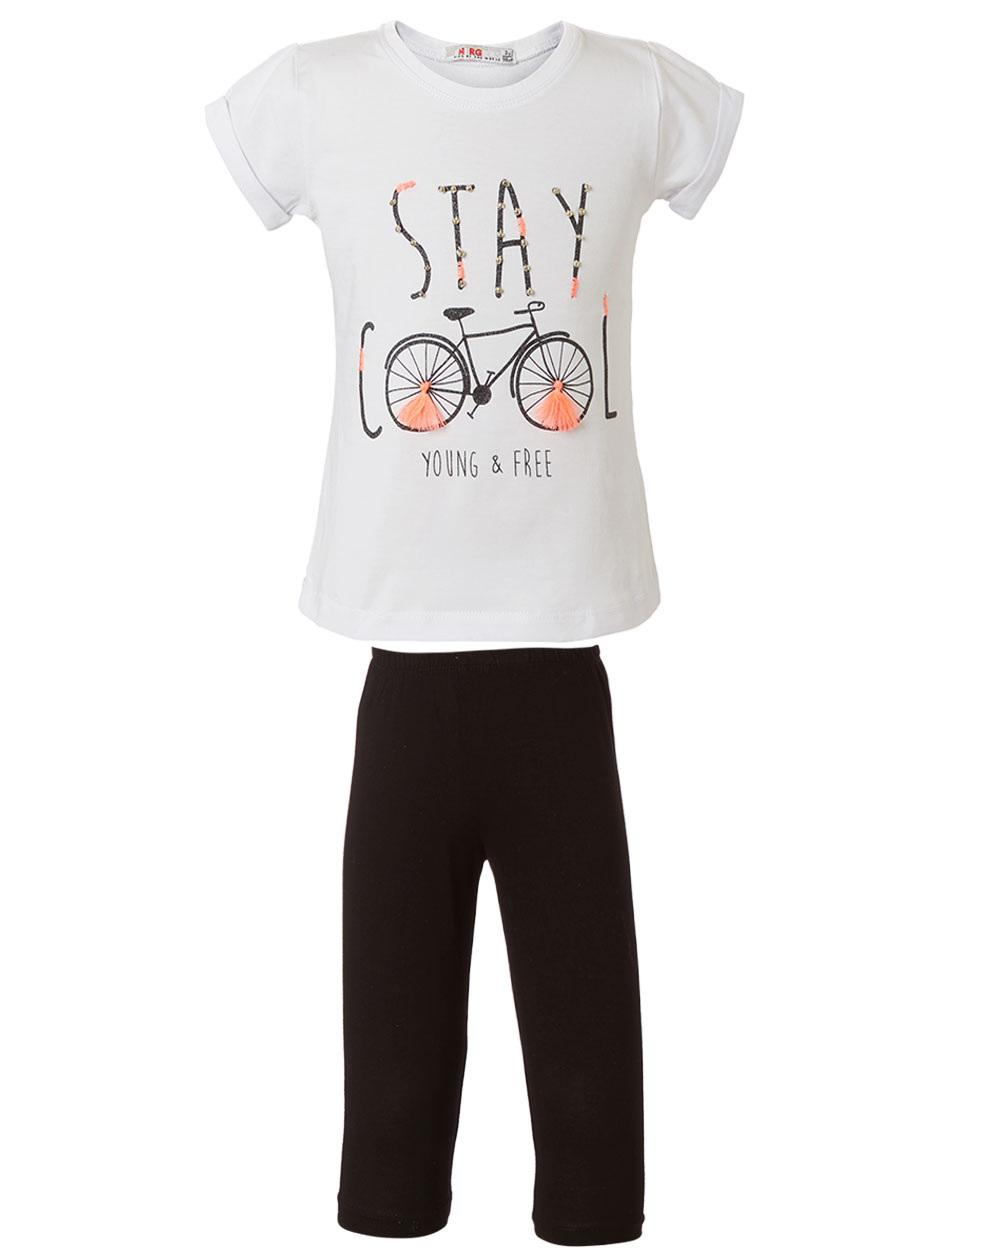 c0db764200a Σετ κολάν και μπλούζα με τύπωμα | ΜΑΥΡΟ | Energiers